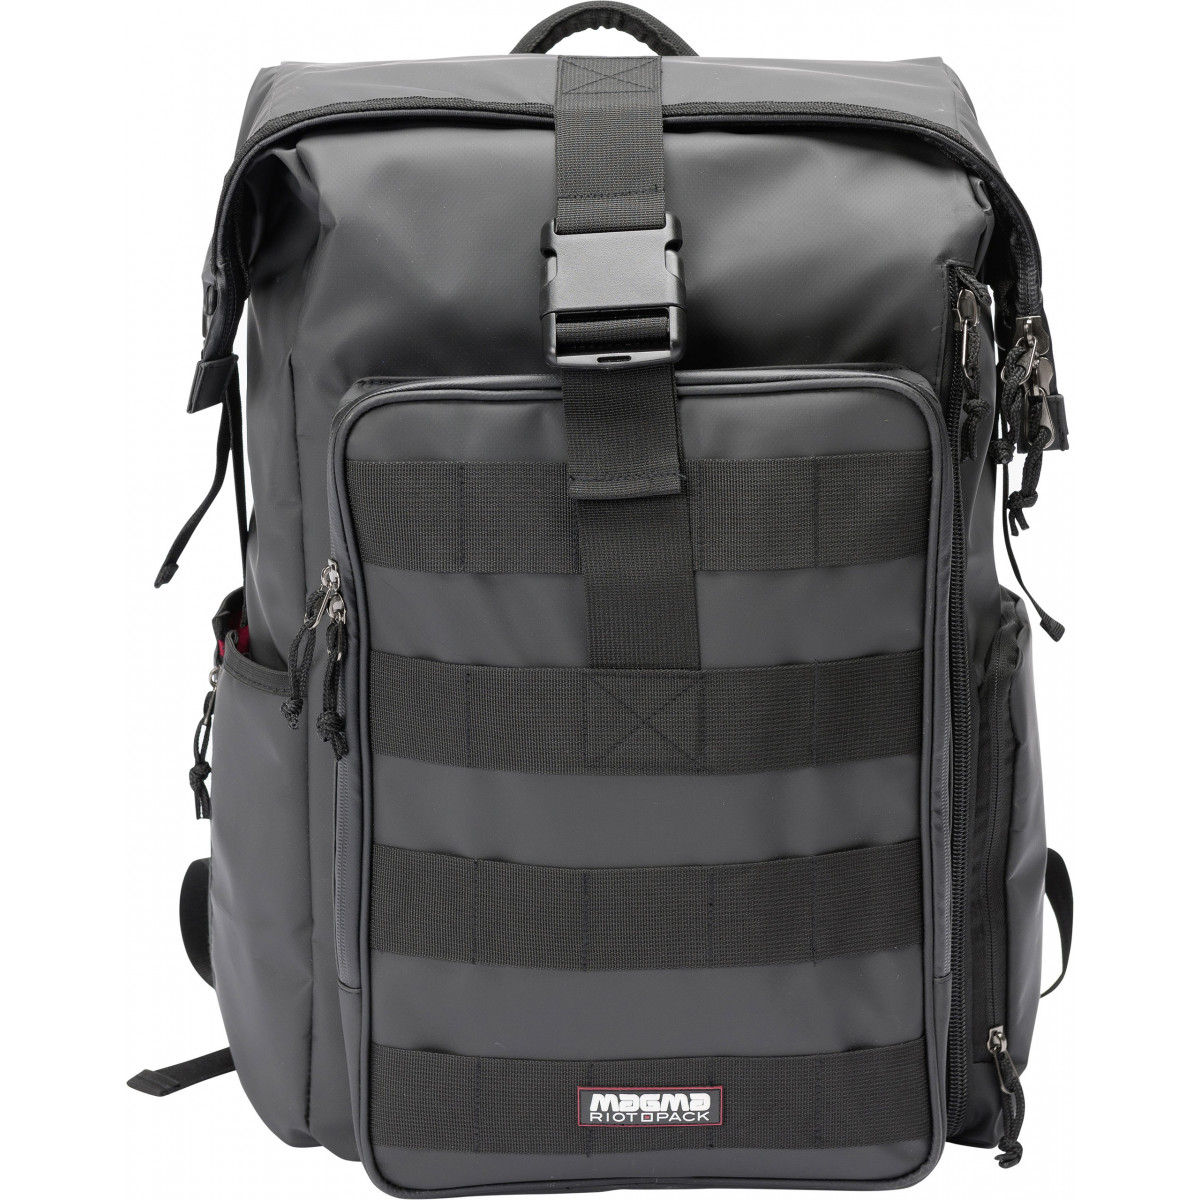 951e37f958 Magma Riot DJ-Stashpack XL PLUS Universal τσάντα πλάτης